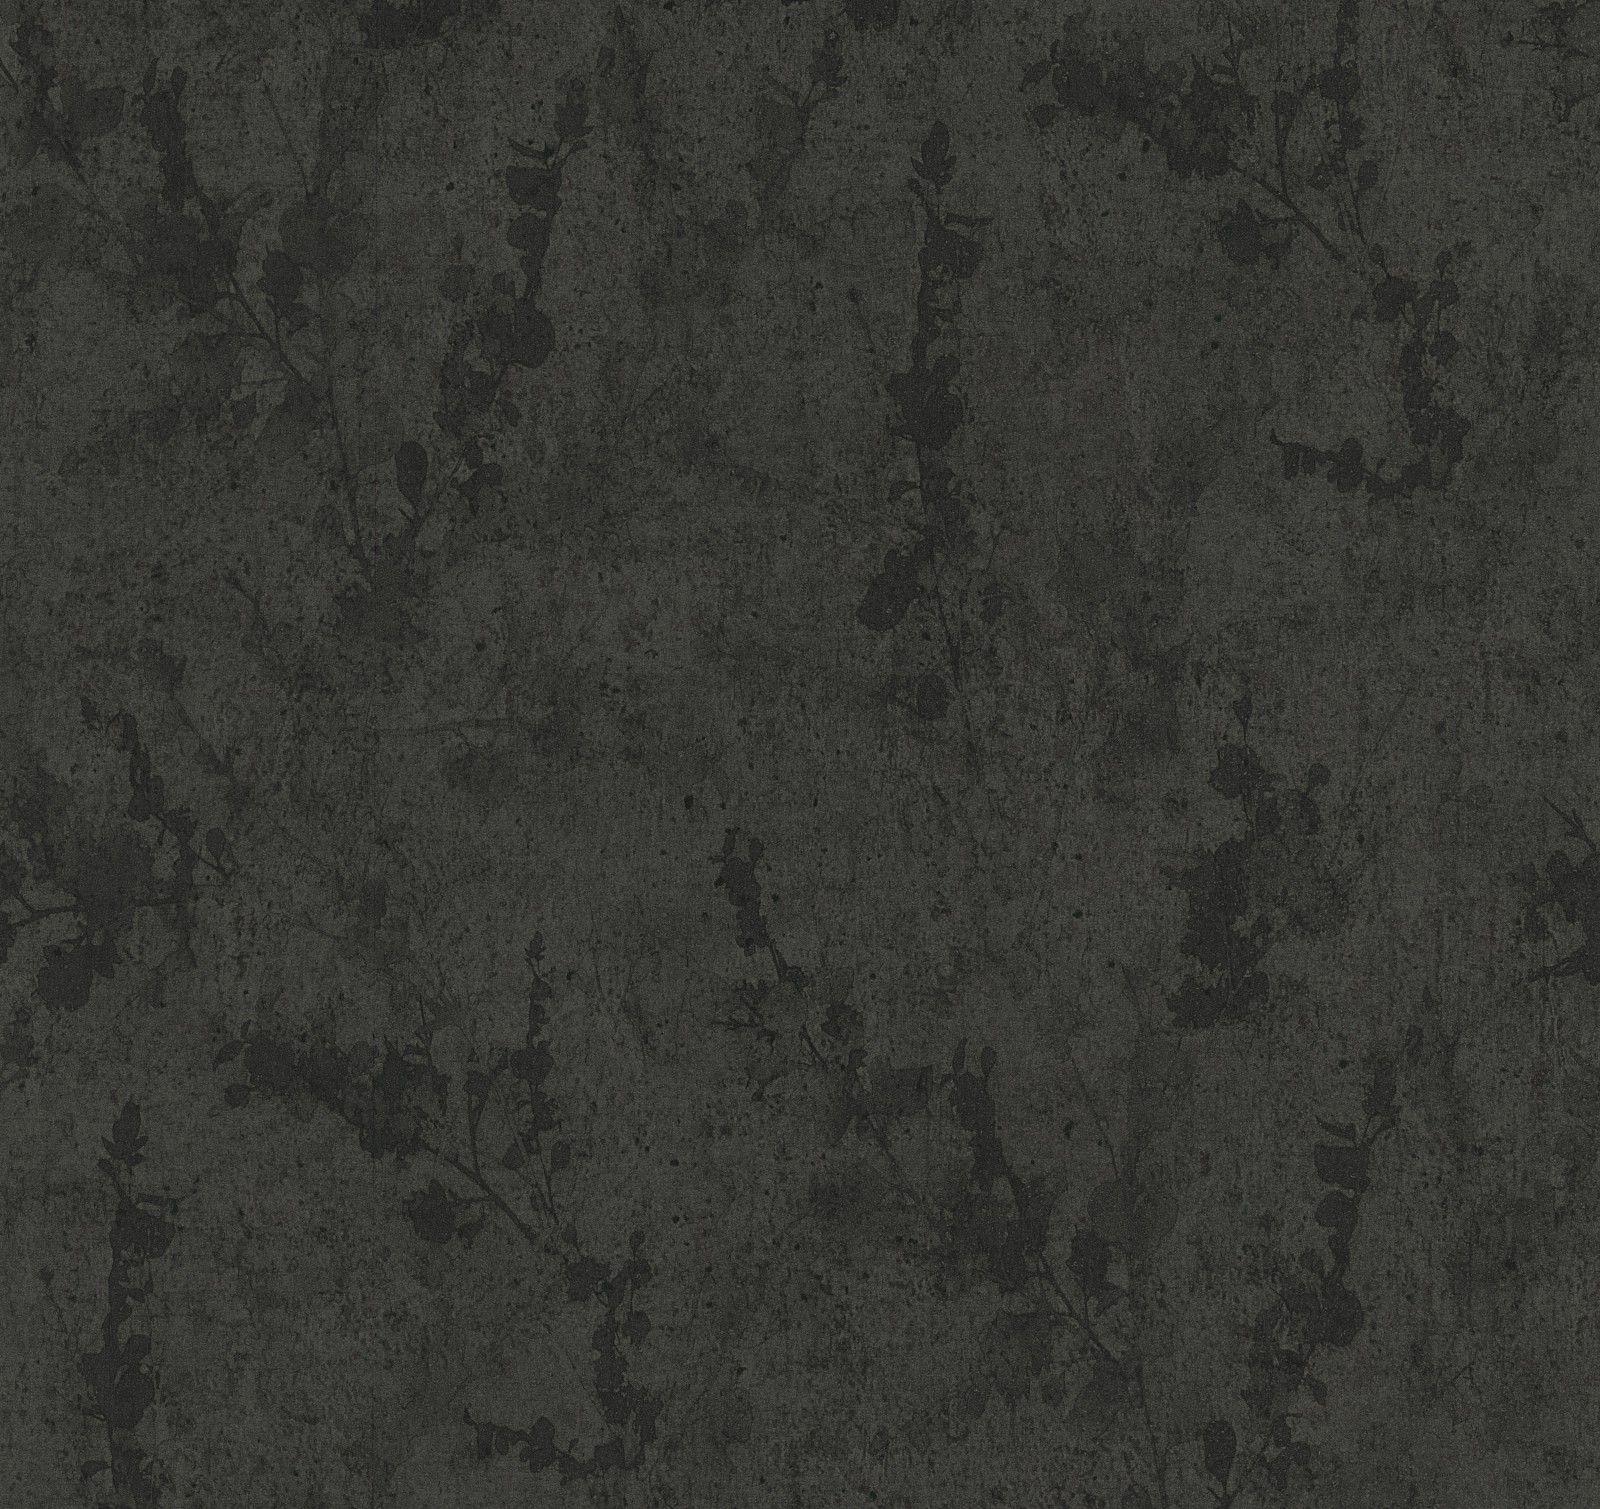 Tapete guido maria kretschmer beton schwarz 02462 30 for Schwarze tapete